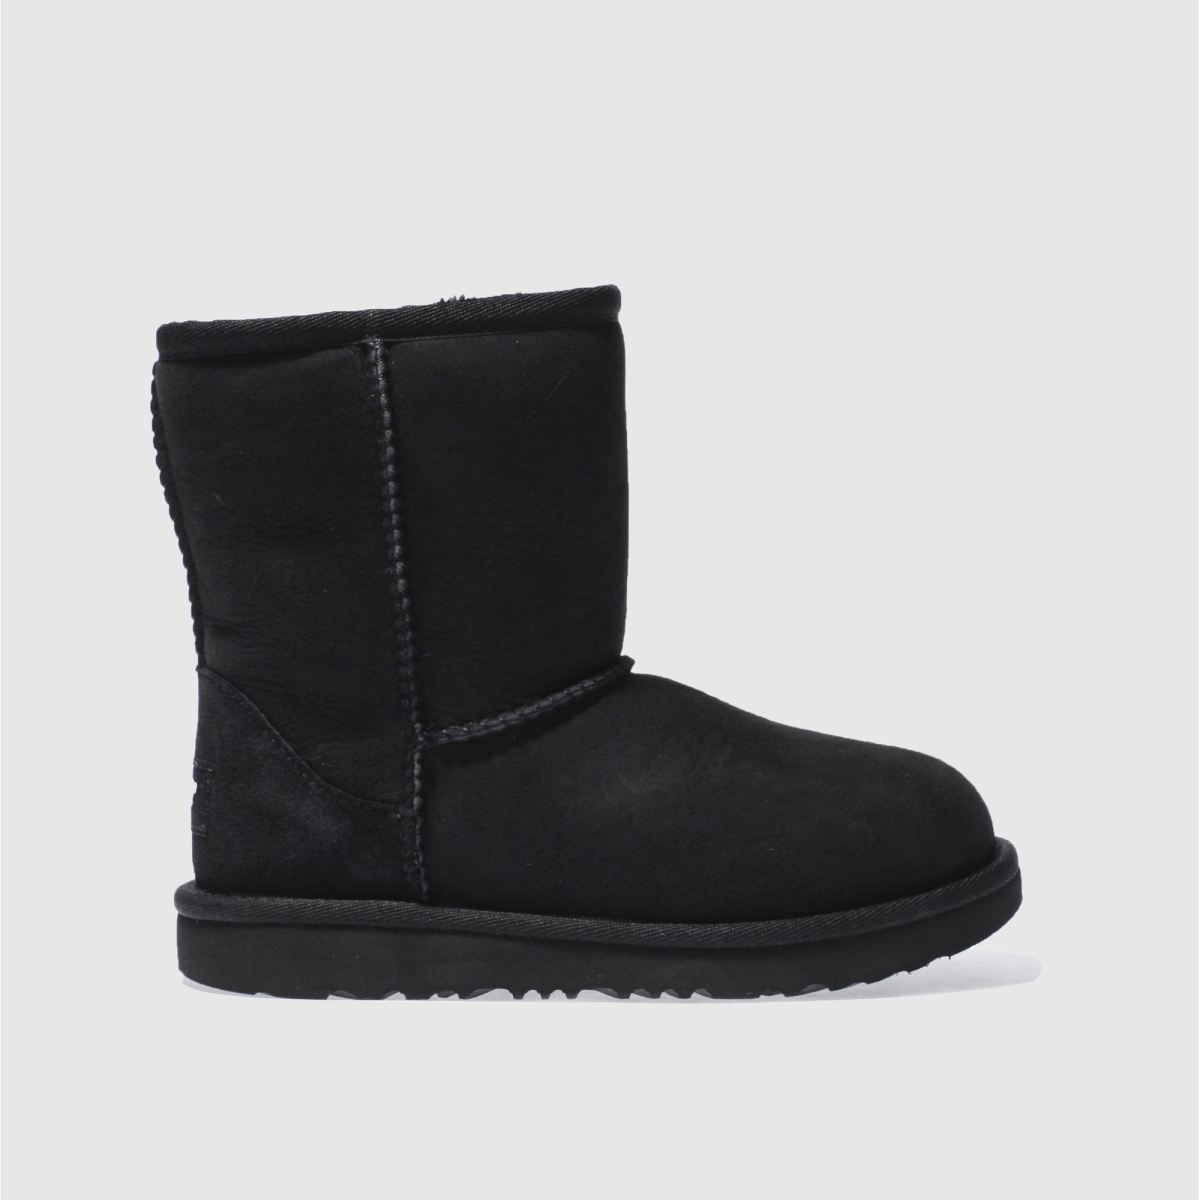 Ugg Black Classic Ii Boots Junior